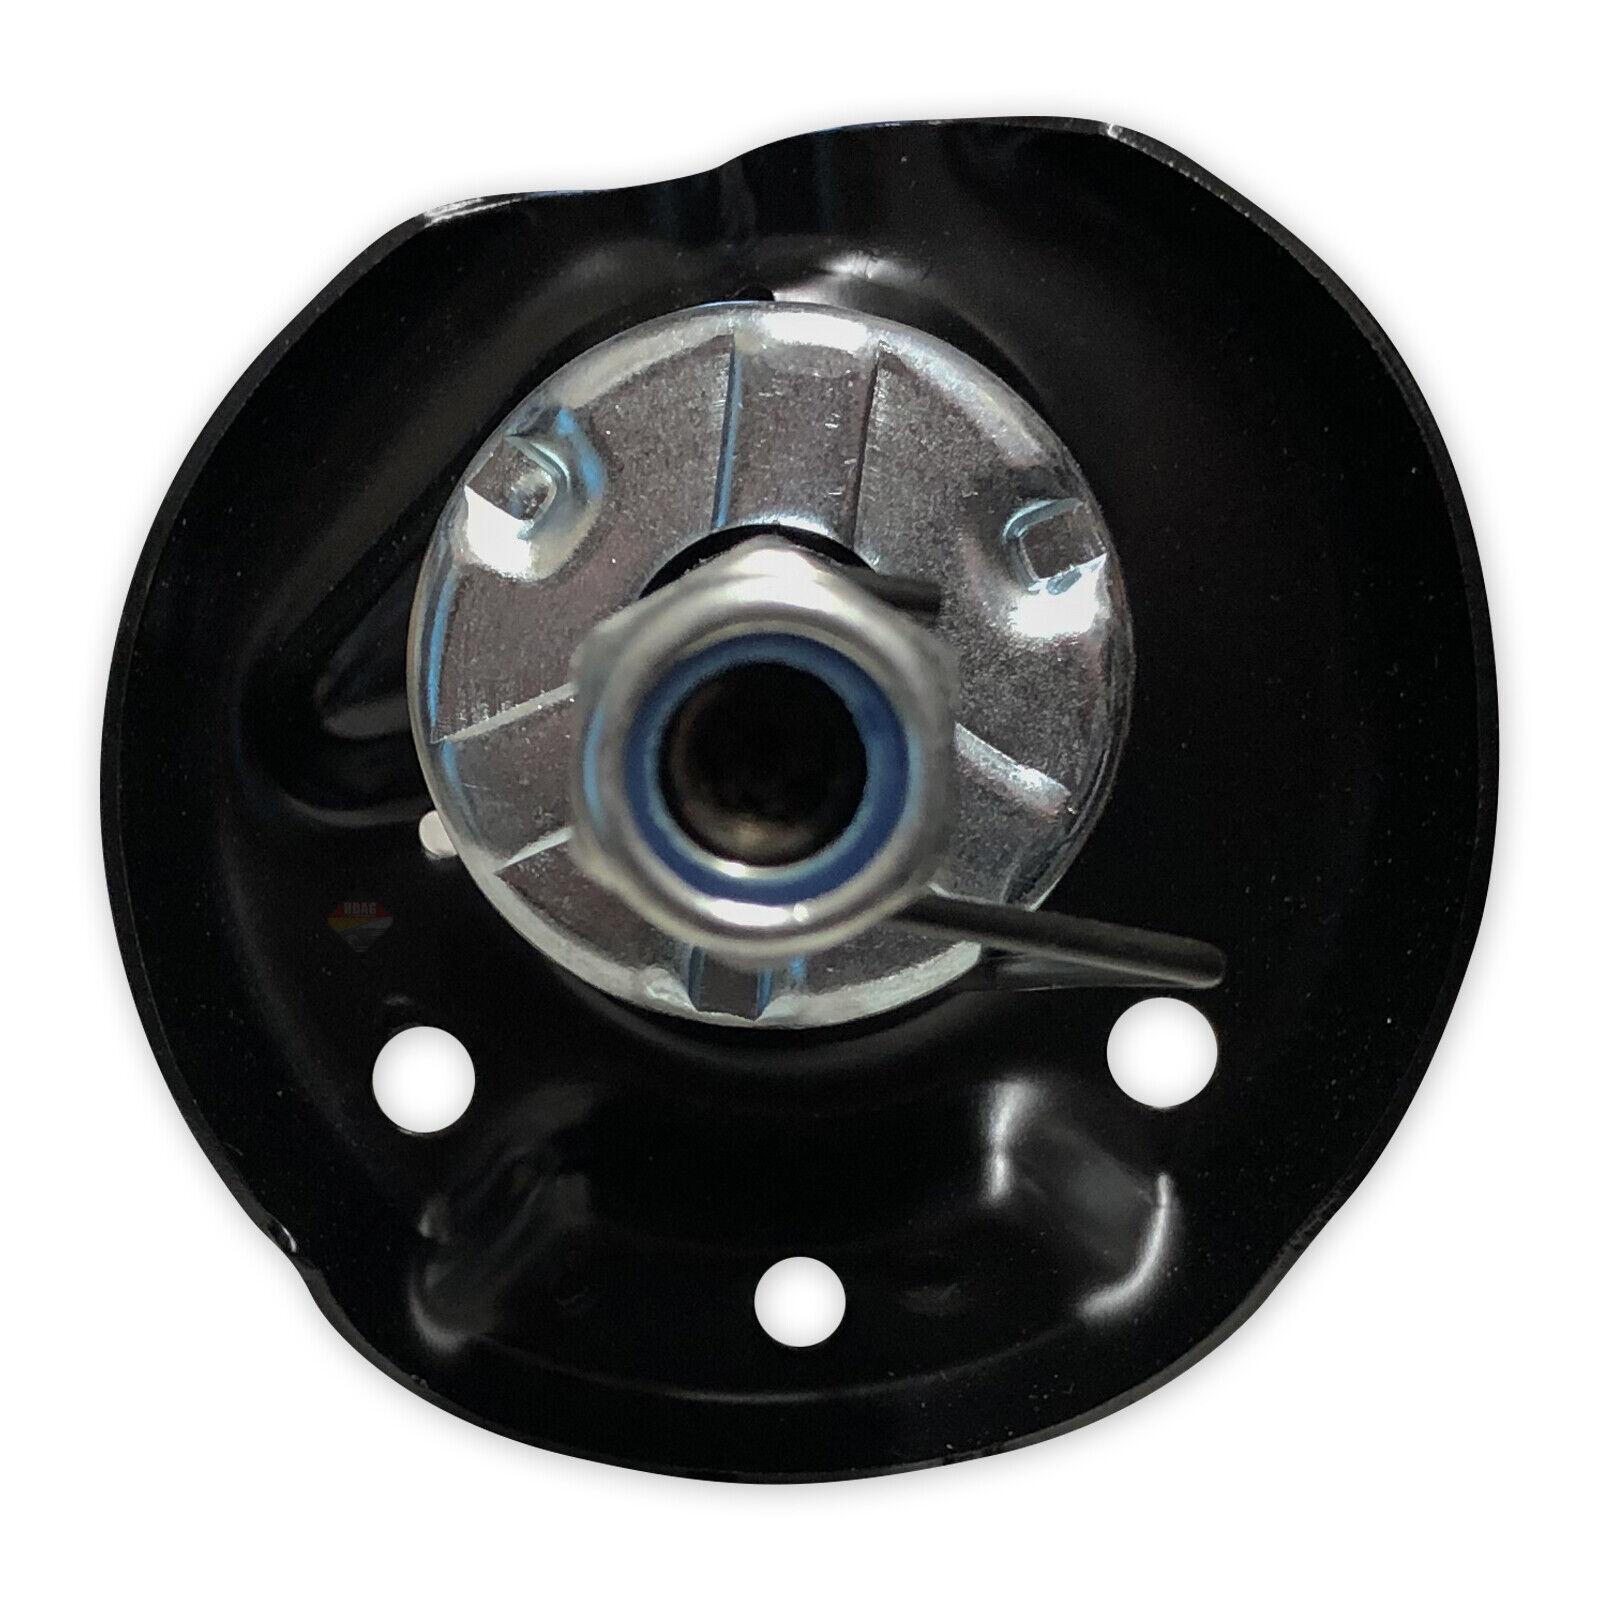 For Vw Scirocco 2008/>2015 2x Rear Suspension Strut Gas Shock Absorber Shocker